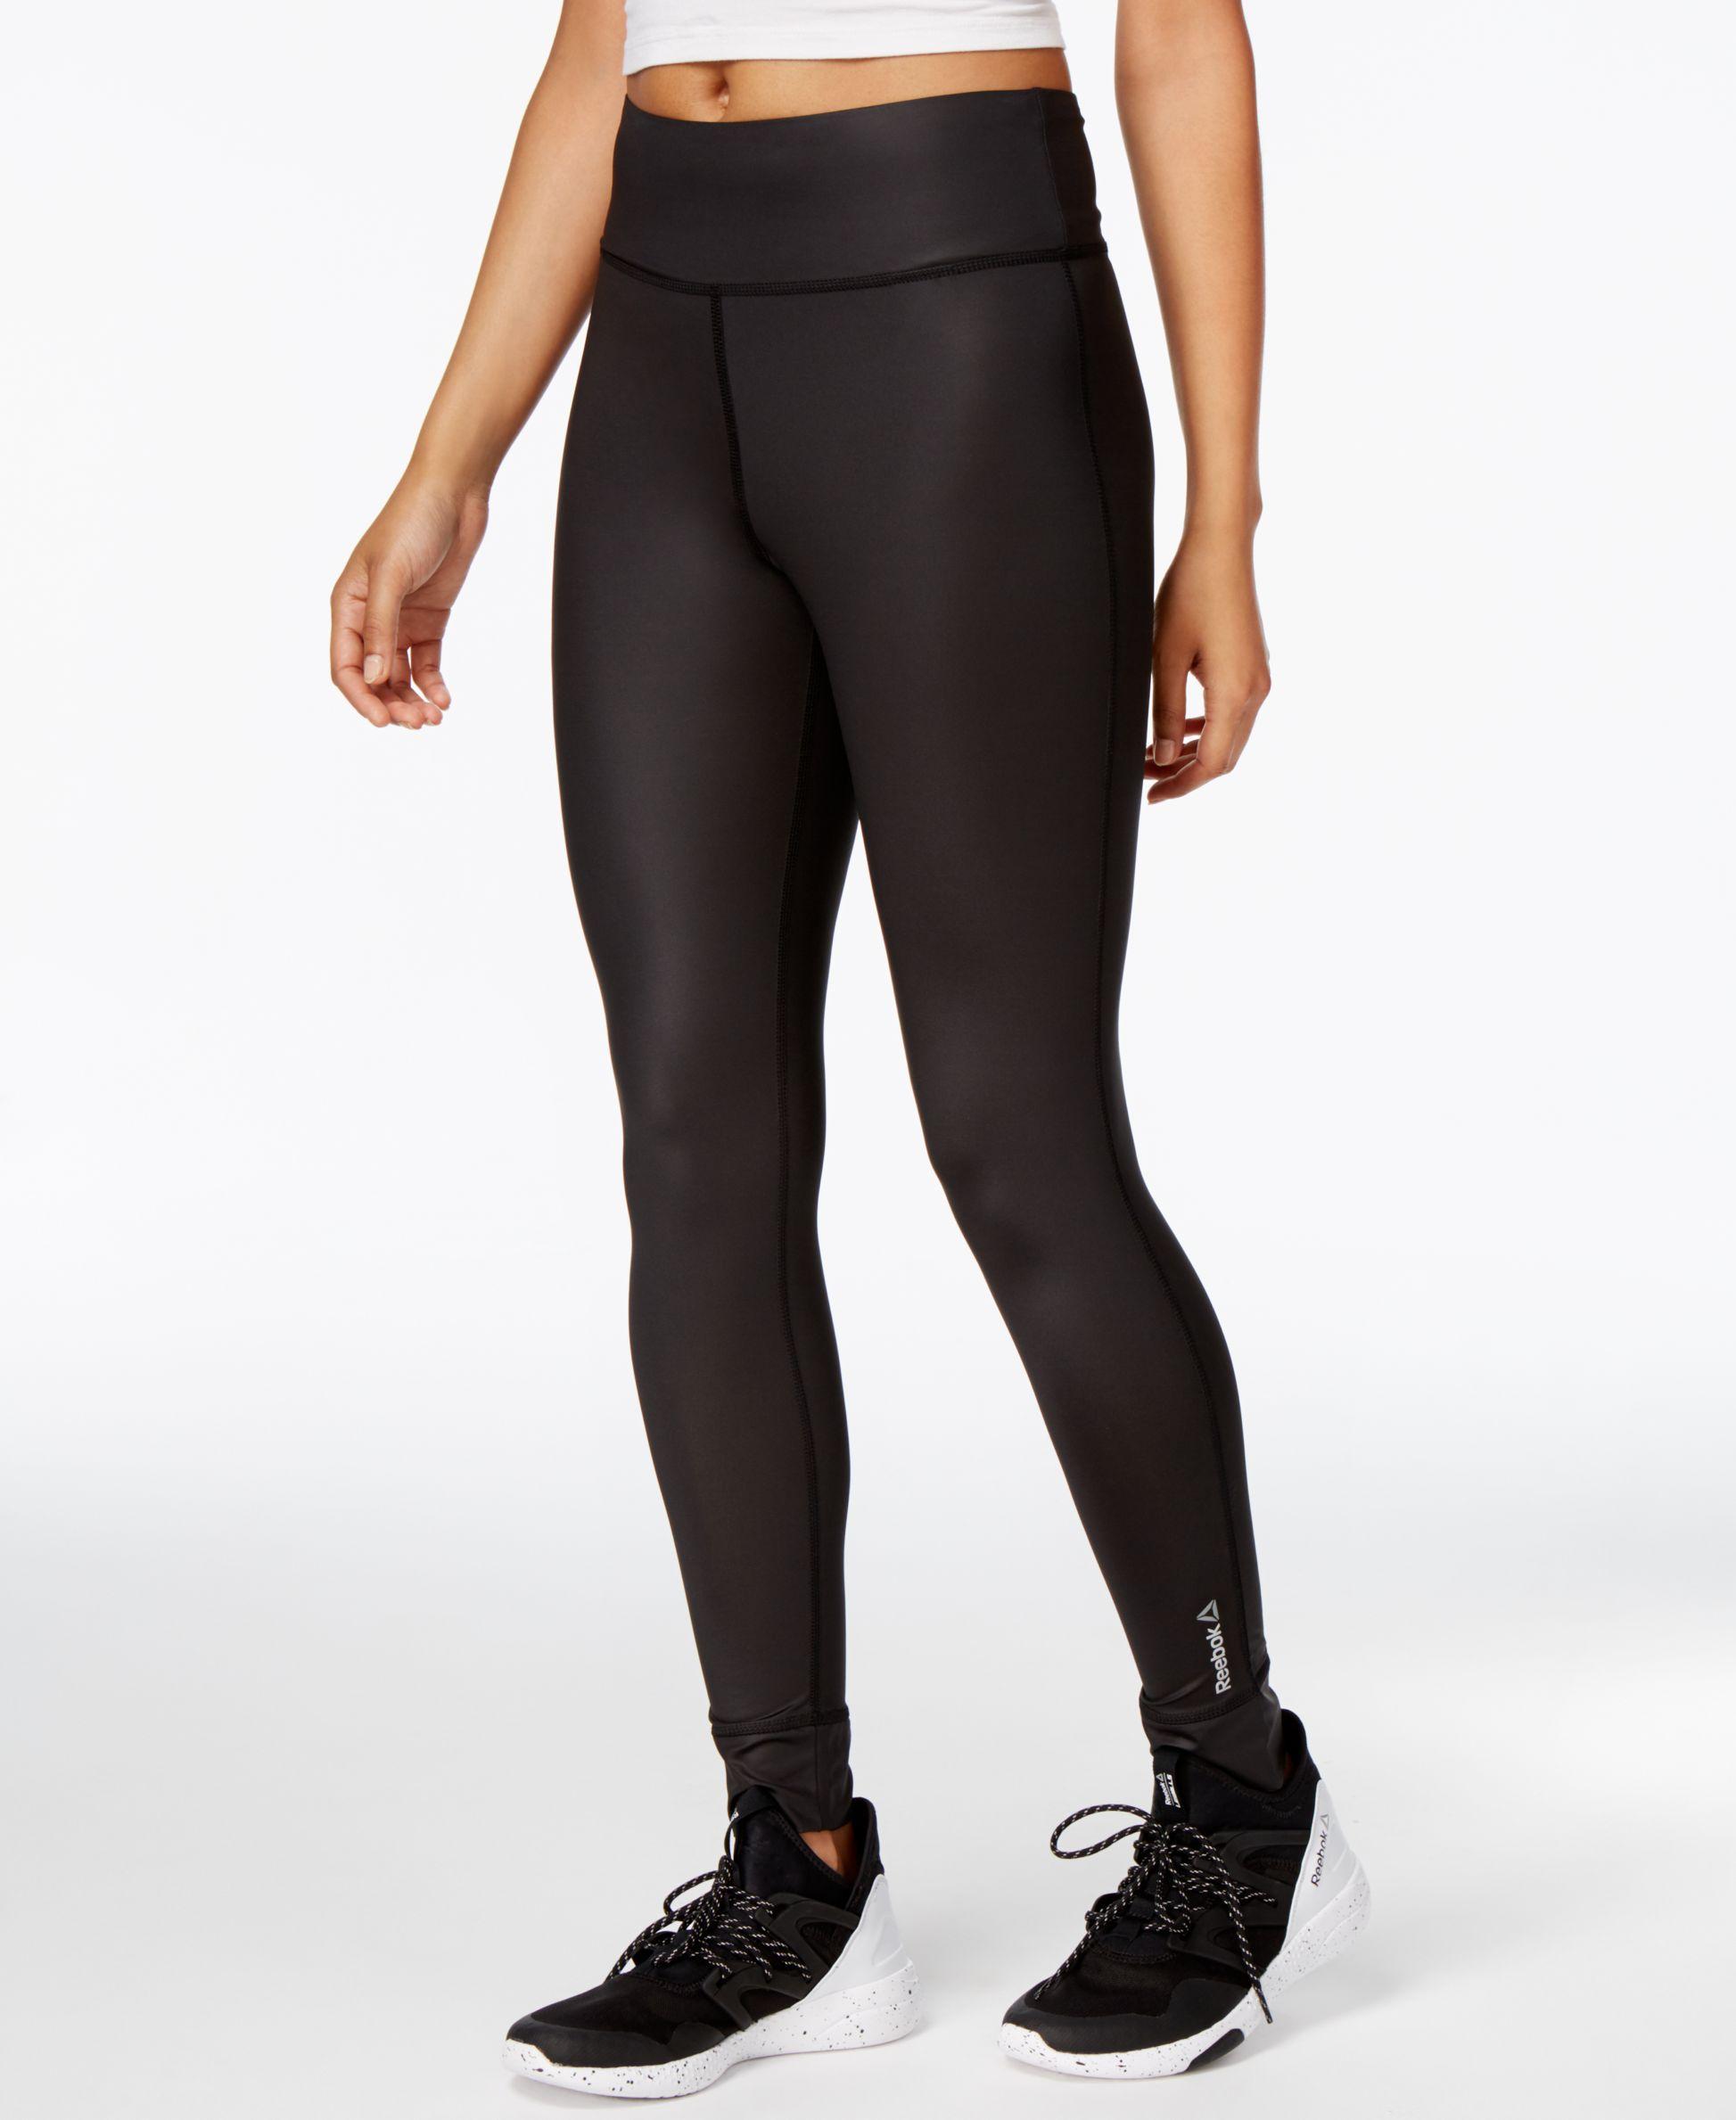 Reebok Speedwick Lux Yoga Leggings Reviews Pants Leggings Women Macy S Yoga Leggings Leggings Are Not Pants Leggings